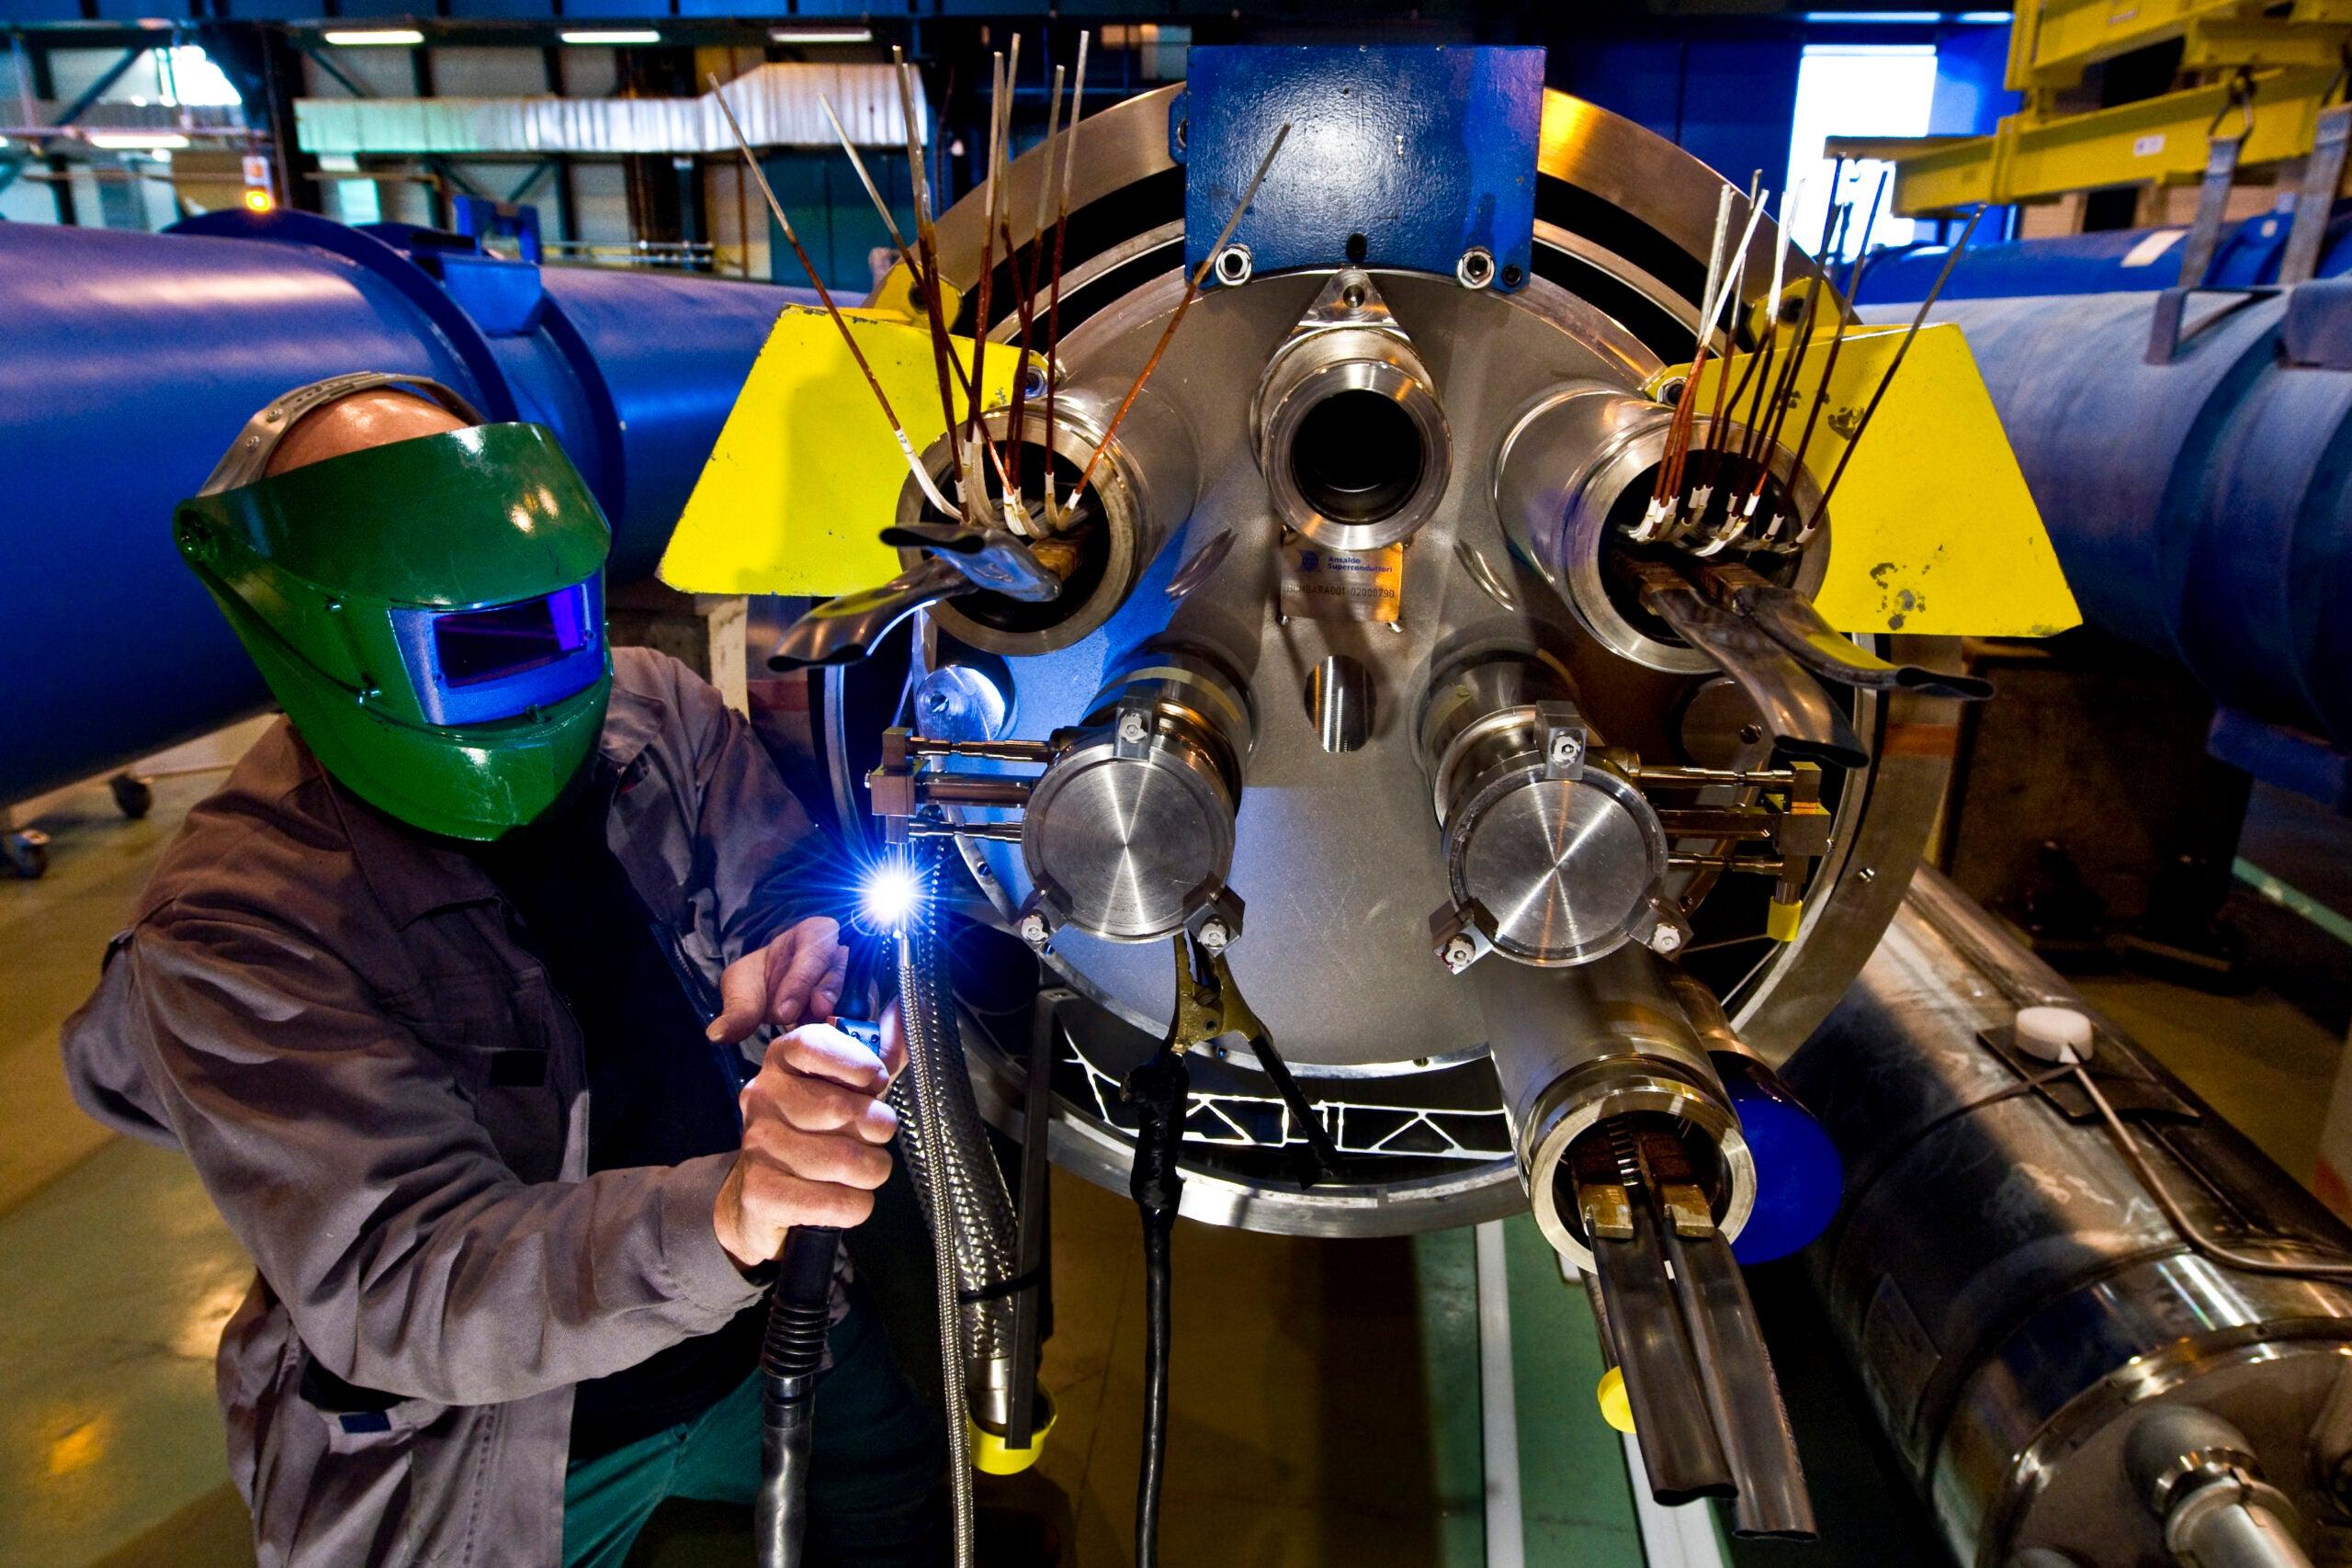 LHC Reawakens, Sending Proton Beams Running at the Speed of Light